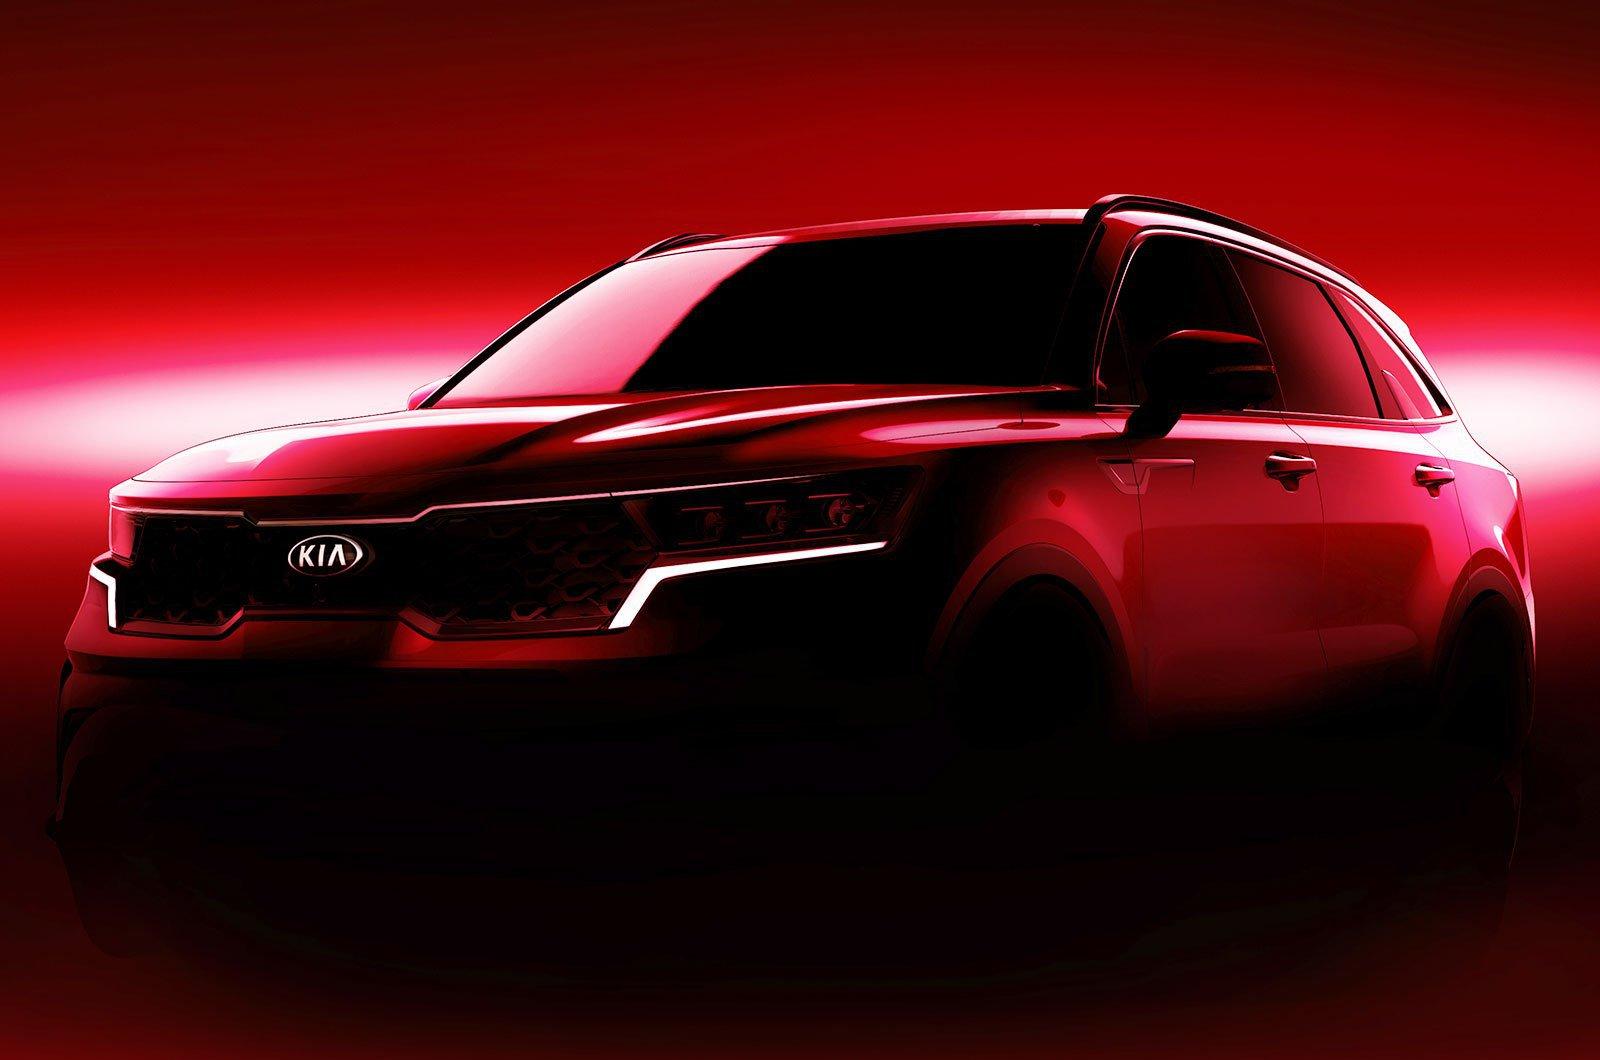 Kia Sorento concept teaser image